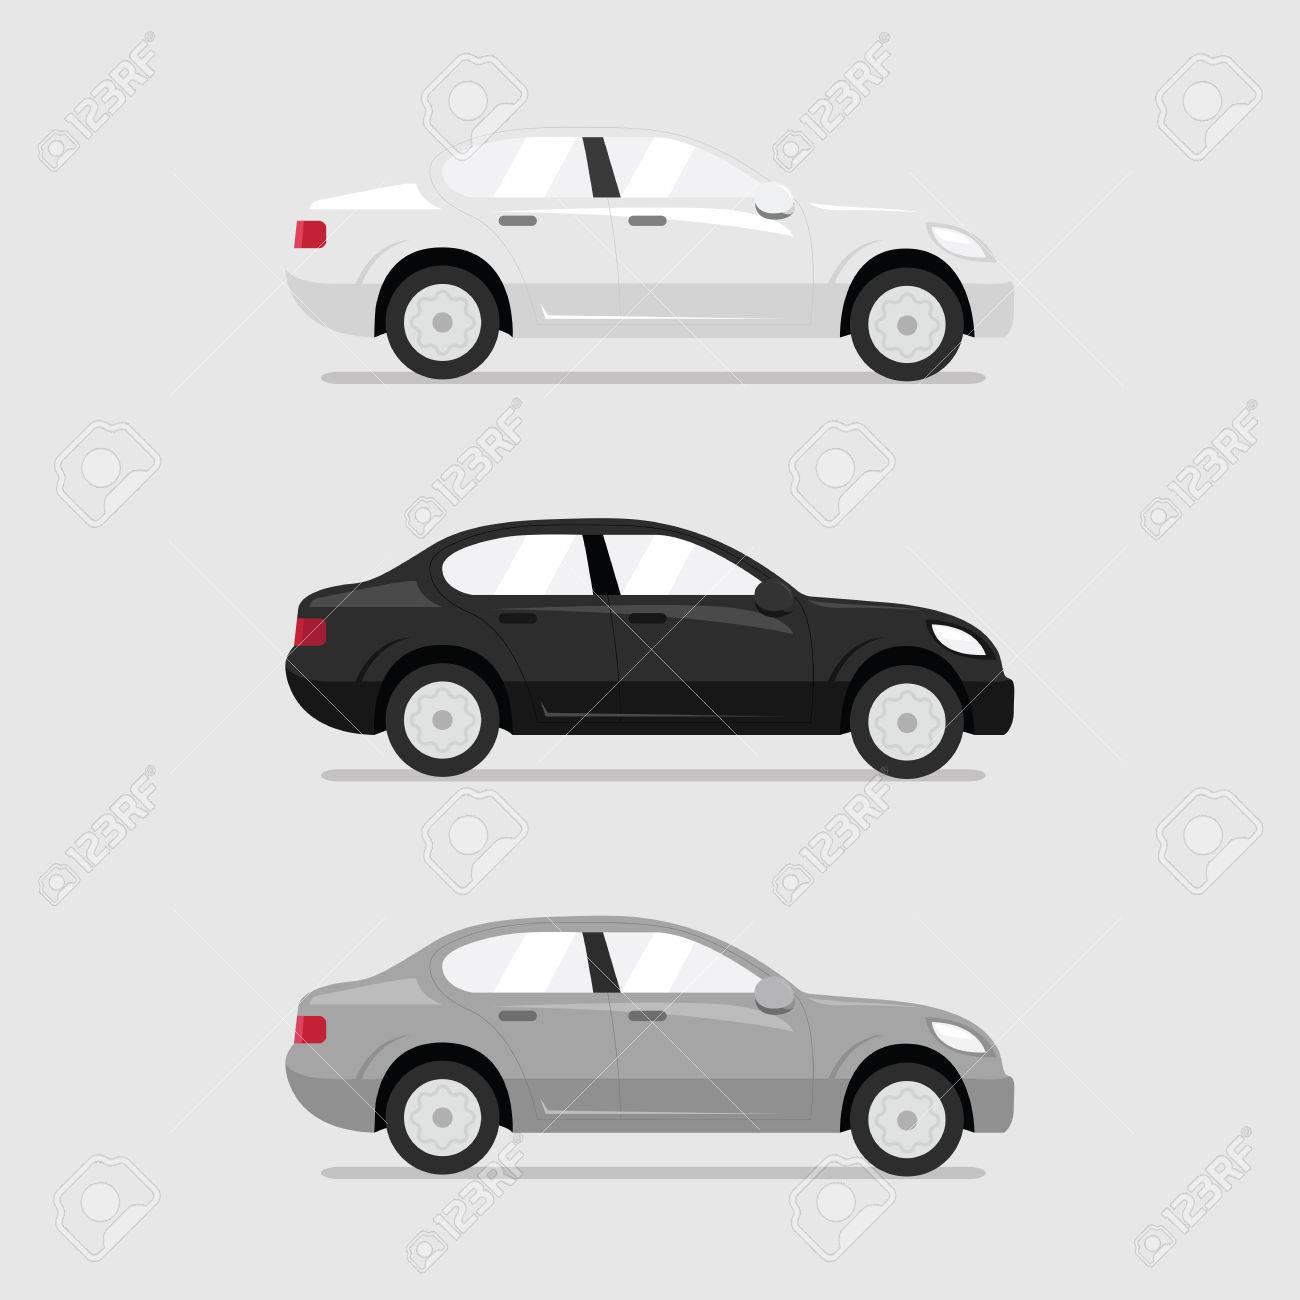 Cars side view. Vector flat illustration set.